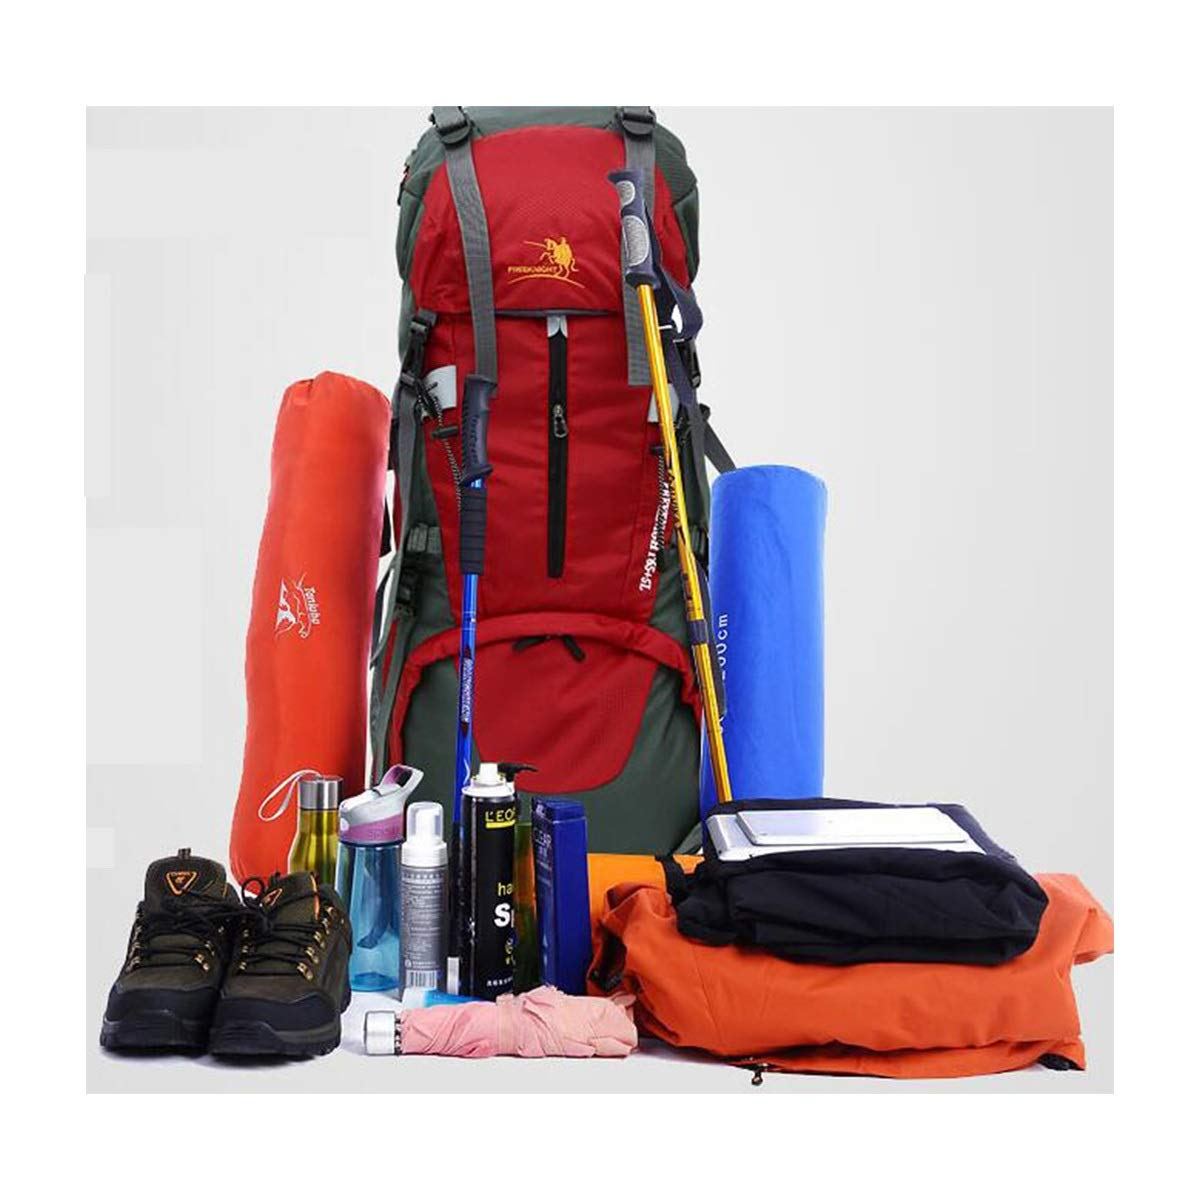 Waterproof Outdoor Mountaineering Bag Qingduqijian Backpack Internal Frame Backpack Color : Black 65+5L Large Capacity Tourist Hiking Camping Tent Bag